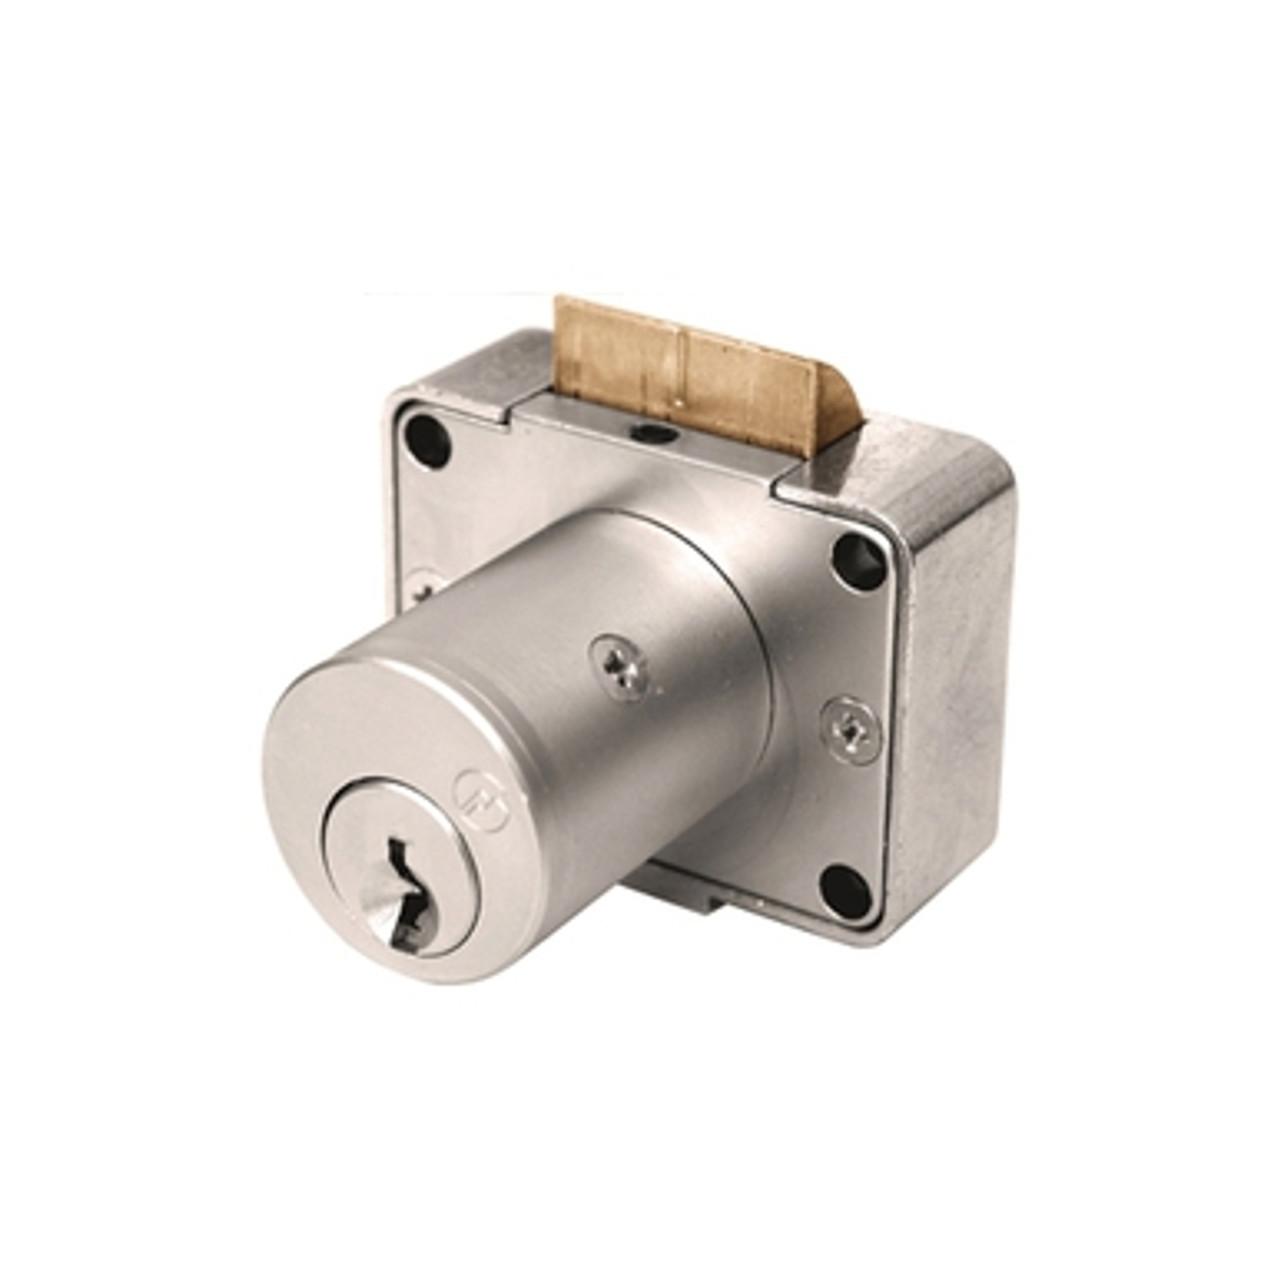 Olympus Lock 754lc 26d 1 3 8 Sargent Cabinet Door Lock Less Cylinder